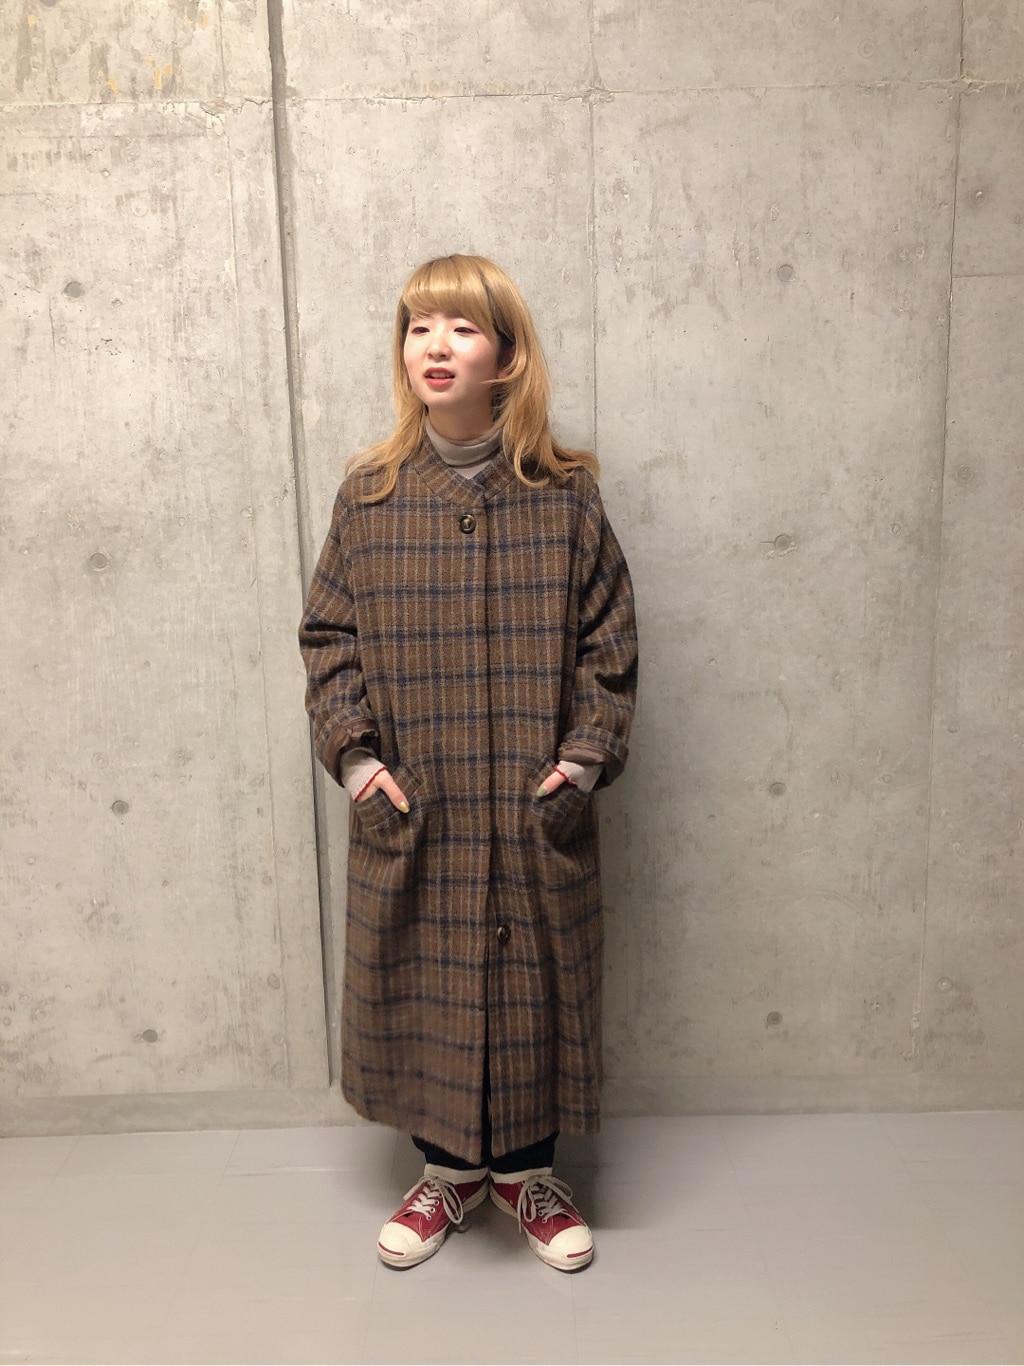 bulle de savon 阪急西宮ガーデンズ 身長:152cm 2019.11.07